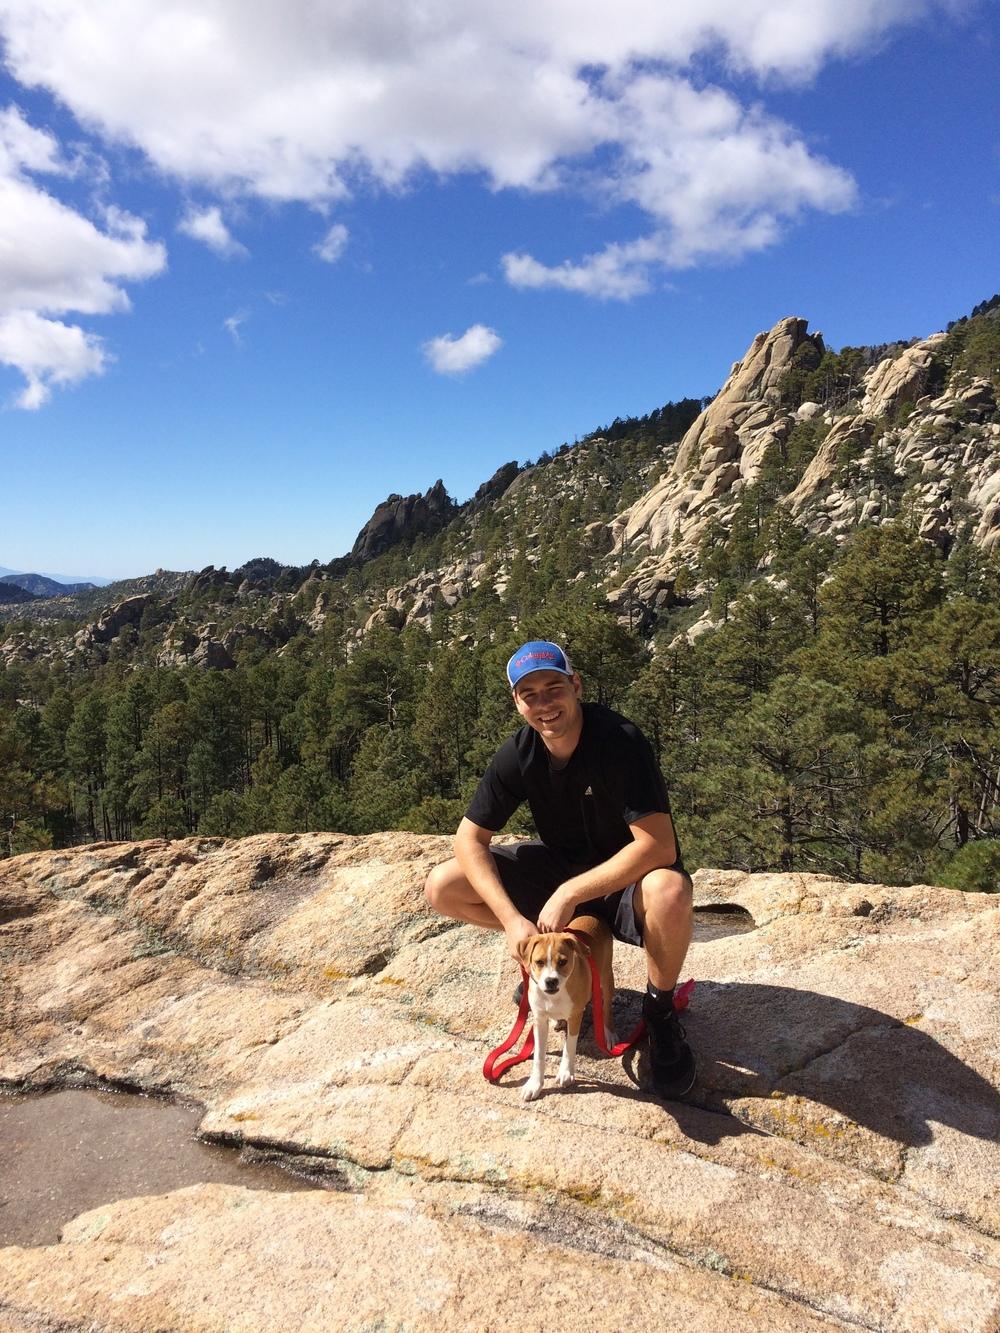 The Pumps first long-distance hike | Mount Lemmon, Tucson, AZ